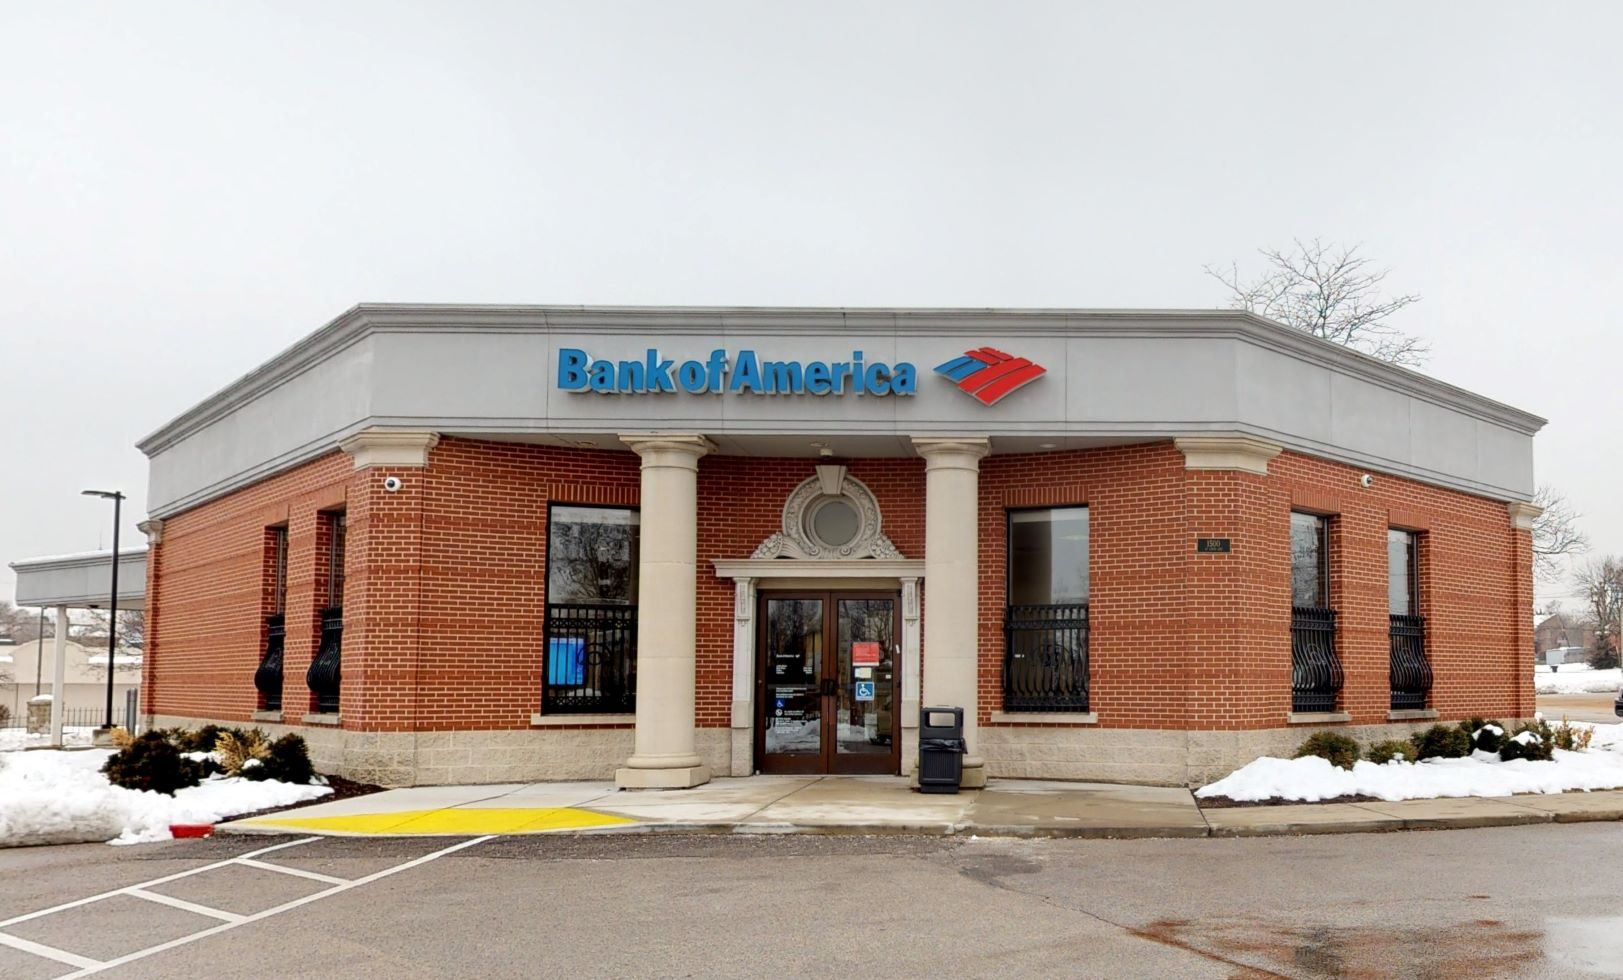 Bank of America financial center with drive-thru ATM   1500 Saint Louis Ave, Saint Louis, MO 63106